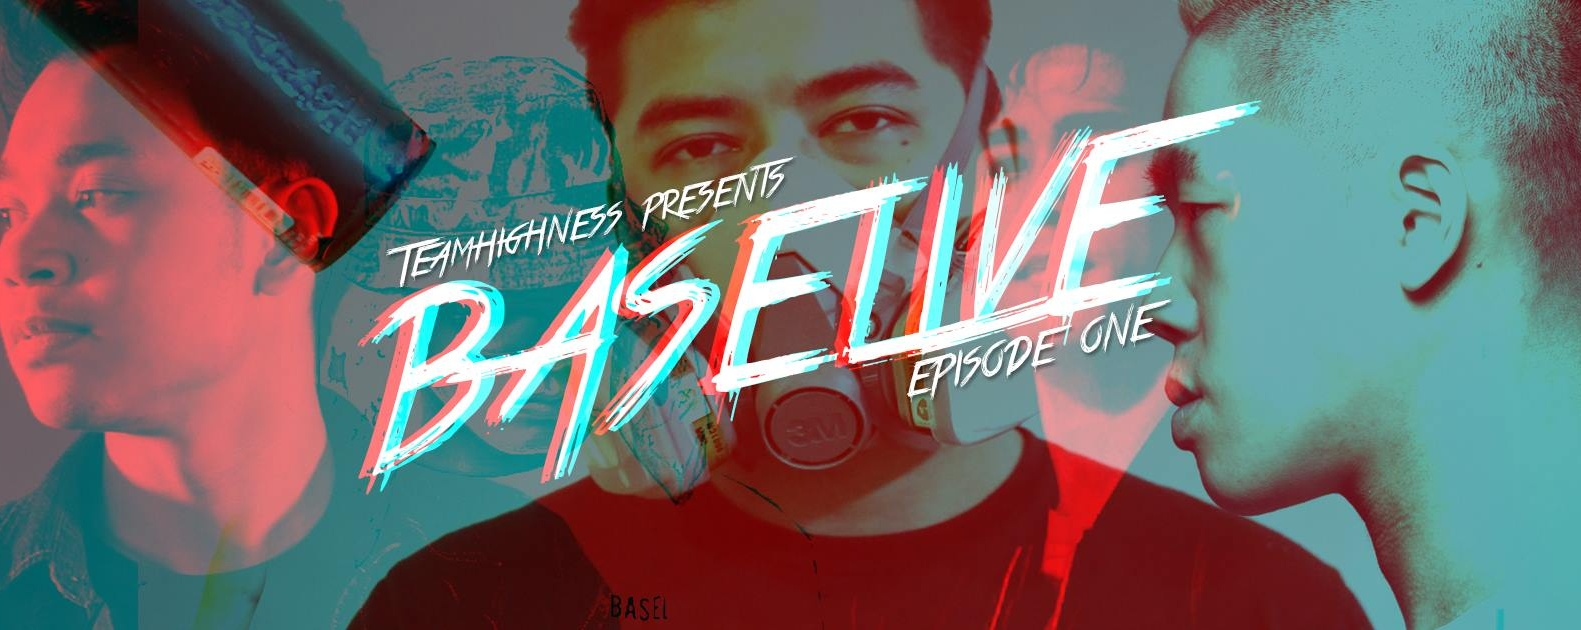 BASE LIVE : EPISODE ONE